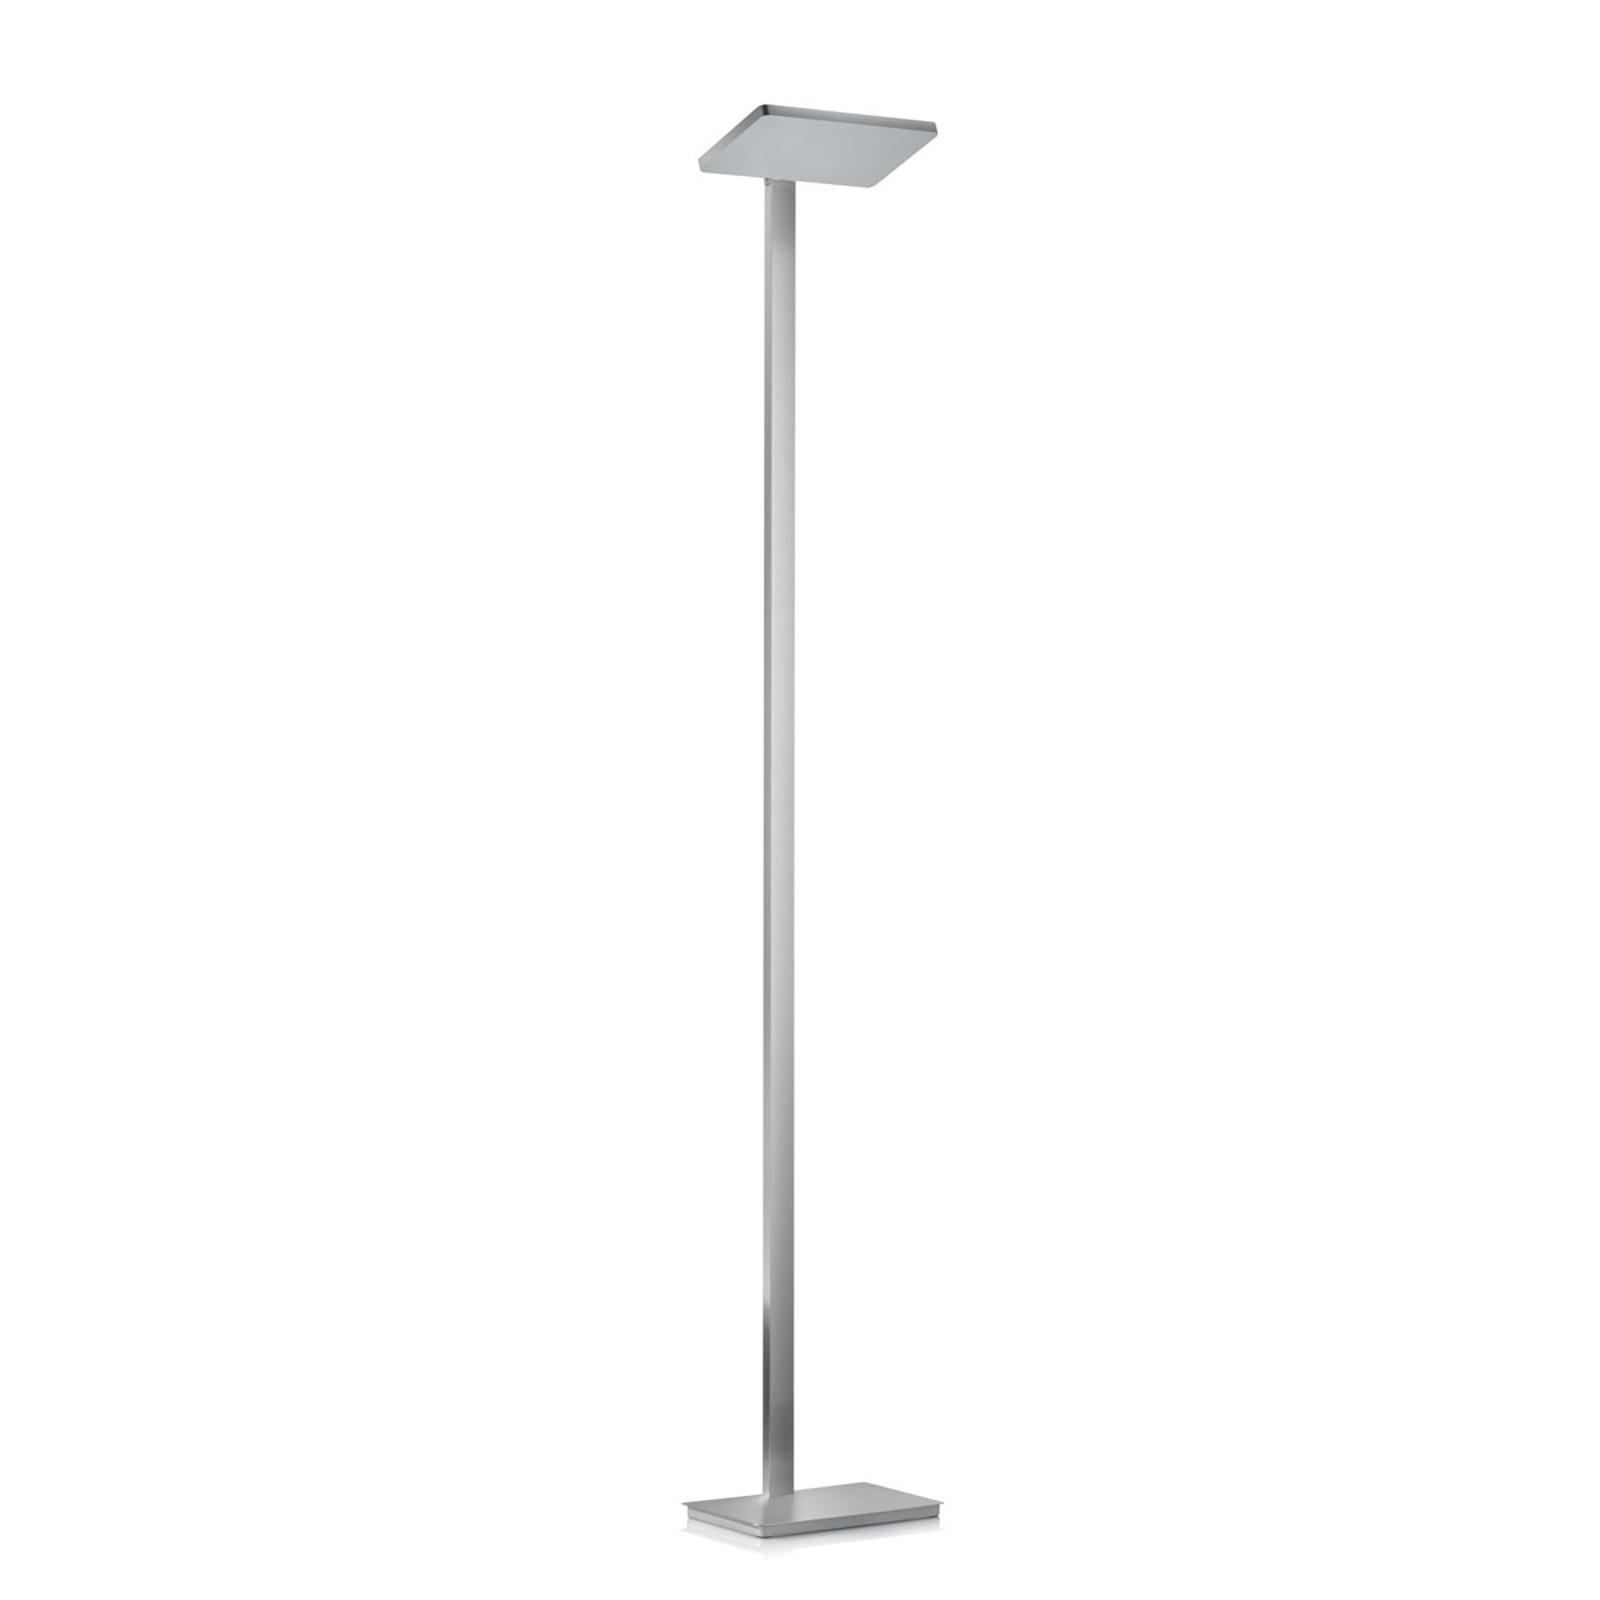 Moderna lampada LED da terra Gerl nichel opaco